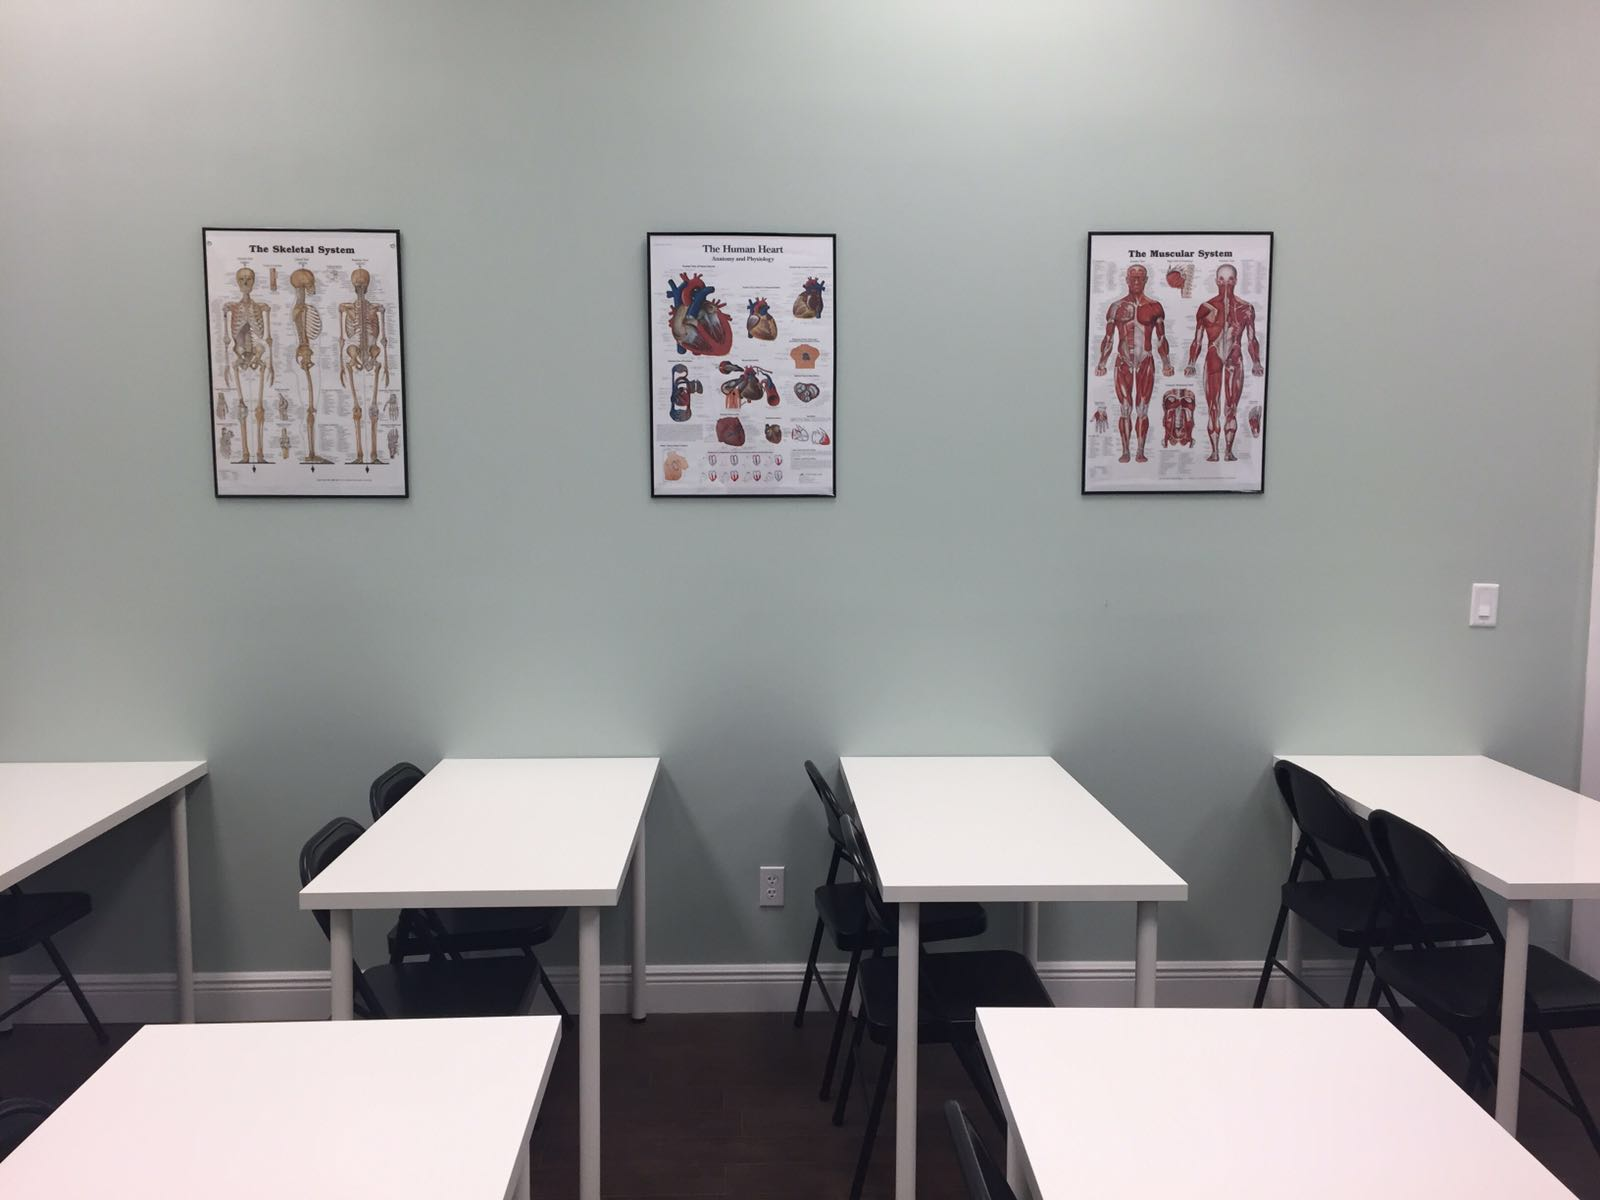 Naples Nursing Classroom